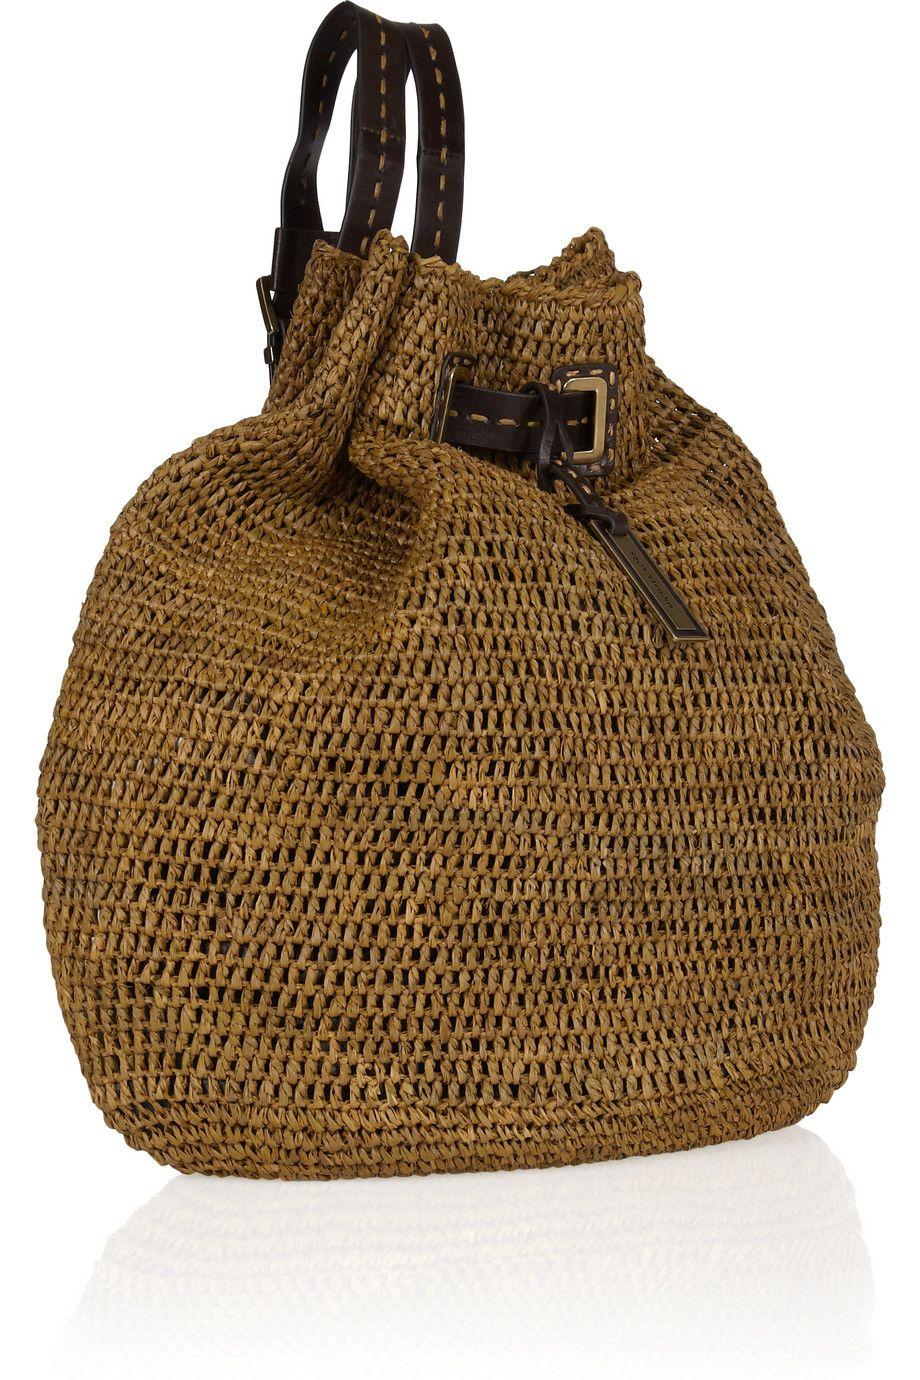 12139621f83c07 Michael Kors Santorini raffia and leather backpack | inside my dream ...